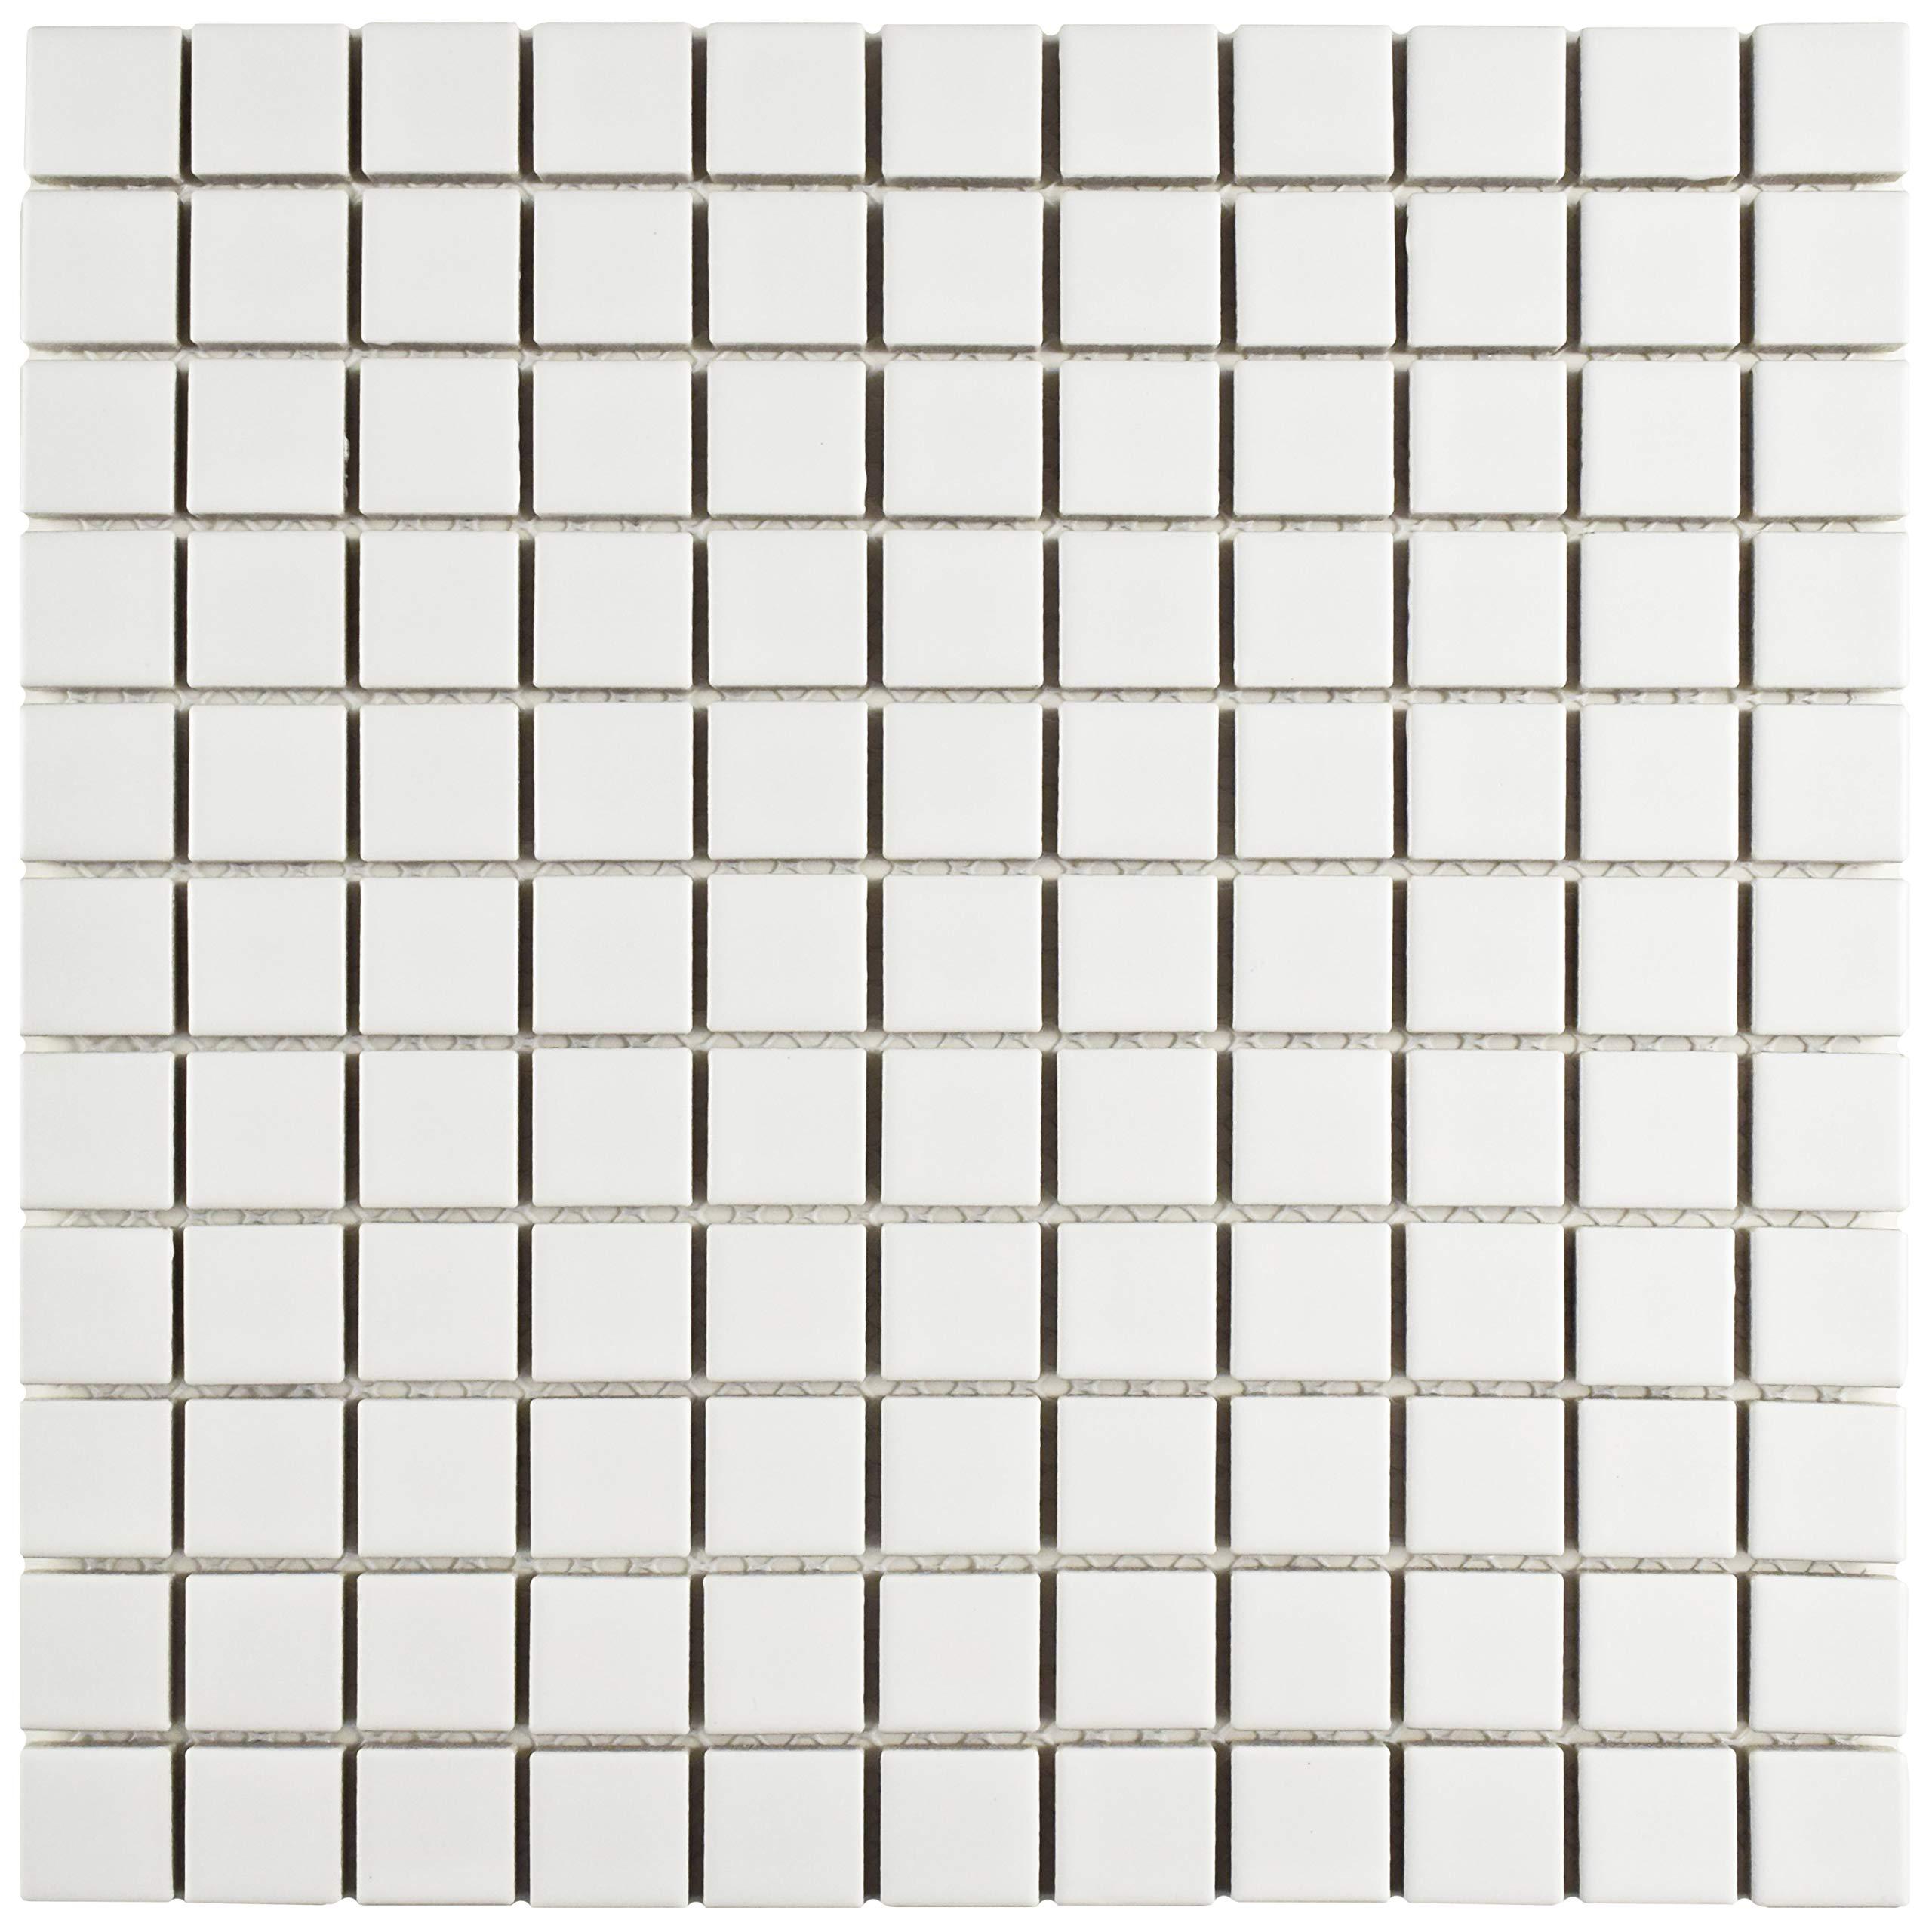 SomerTile FXLM1SMW Retro Square Porcelain Floor and Wall x 11-3/4'', Matte White Tile, 12'' x 12'', 10 Piece